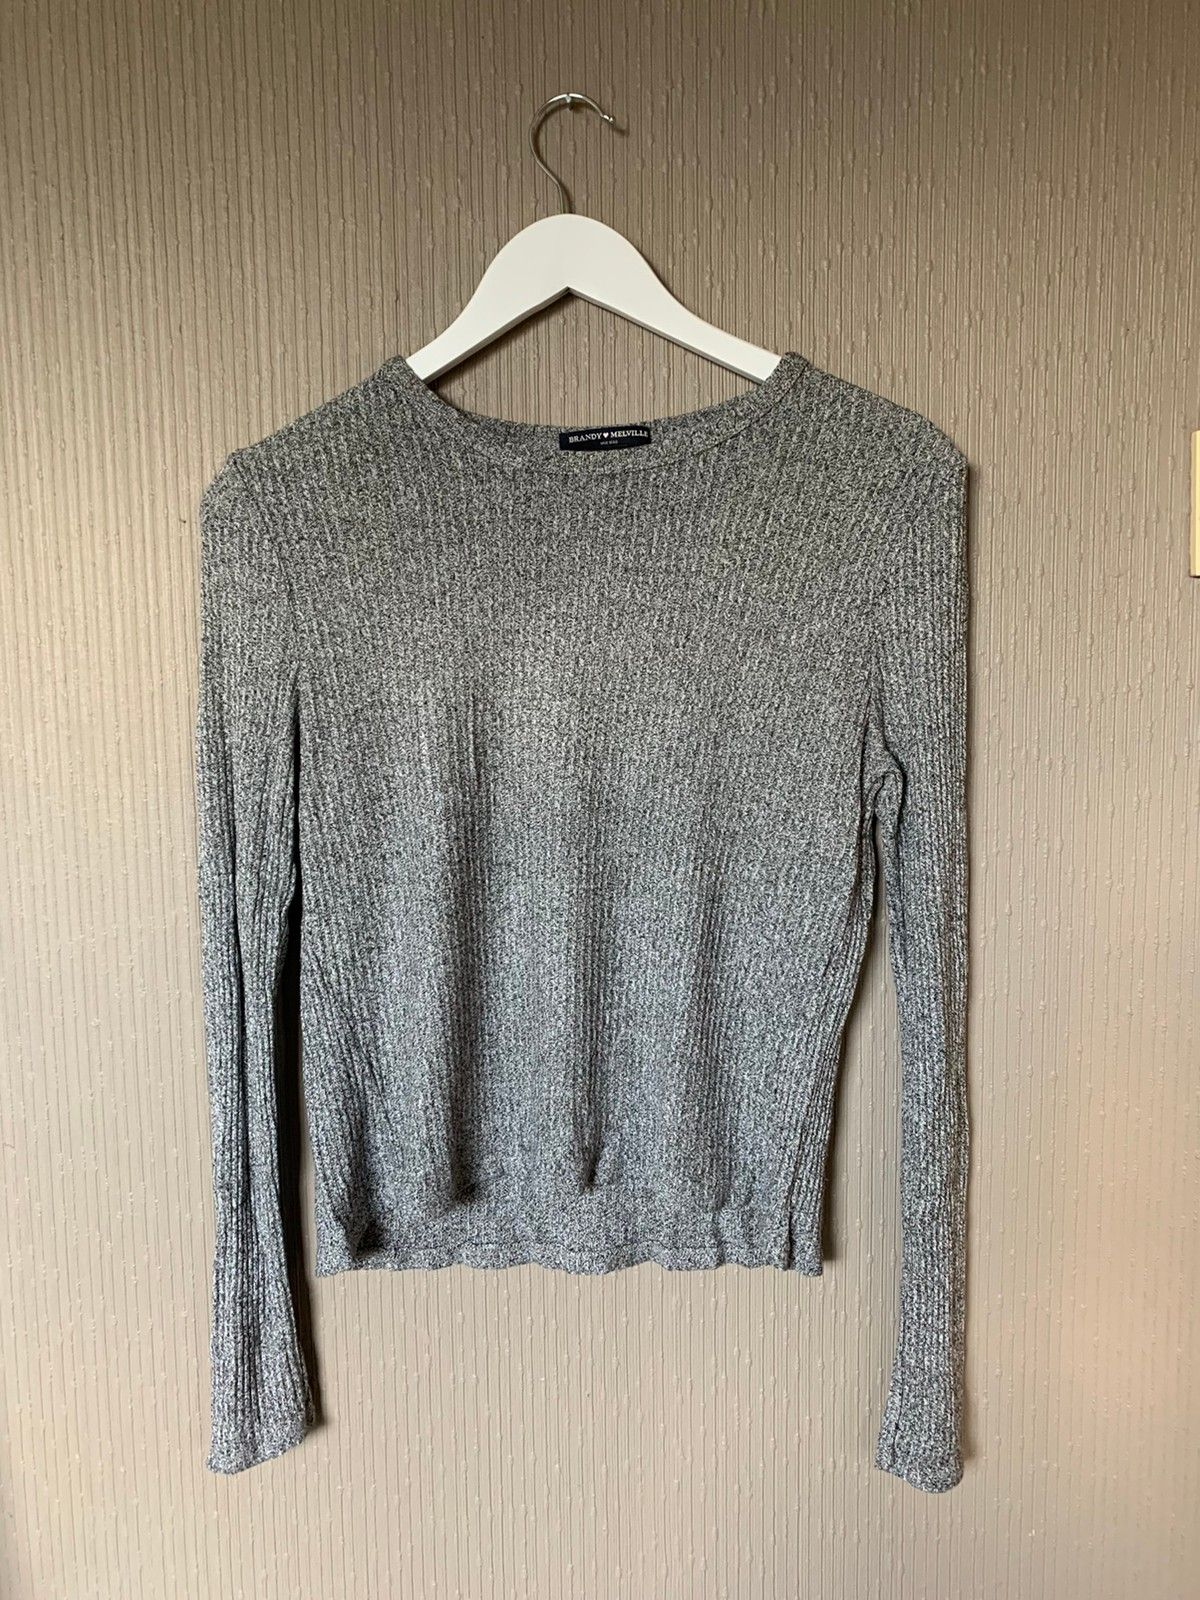 Brandy melville genser | FINN.no